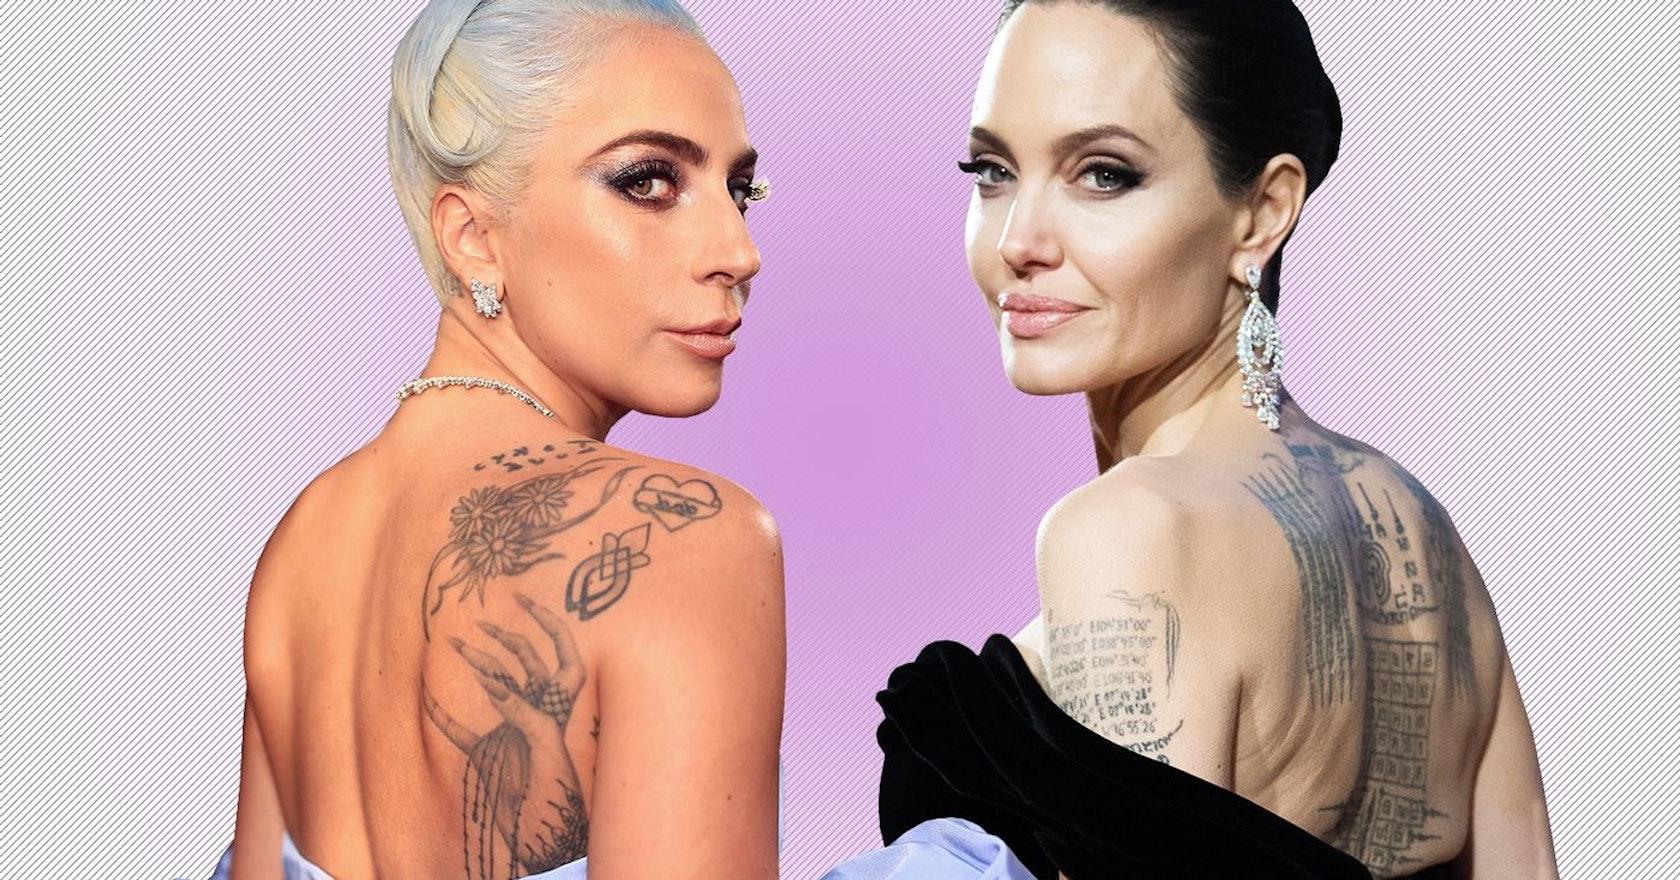 Angelina Jolie vs Lady Gaga: why the Cleopatra movie backlash misses the point